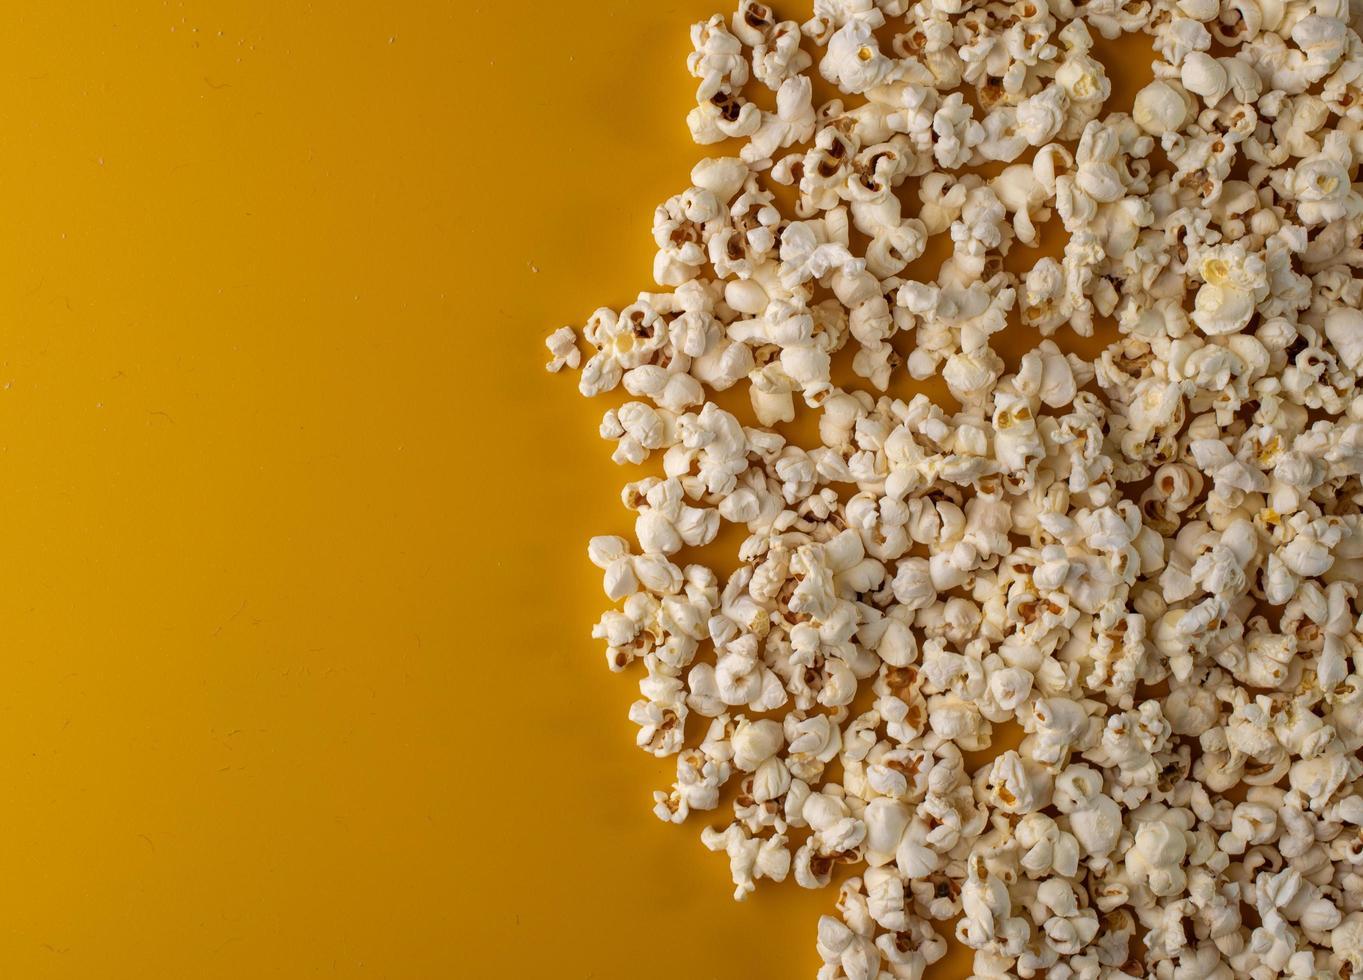 popcorn op gele achtergrond foto